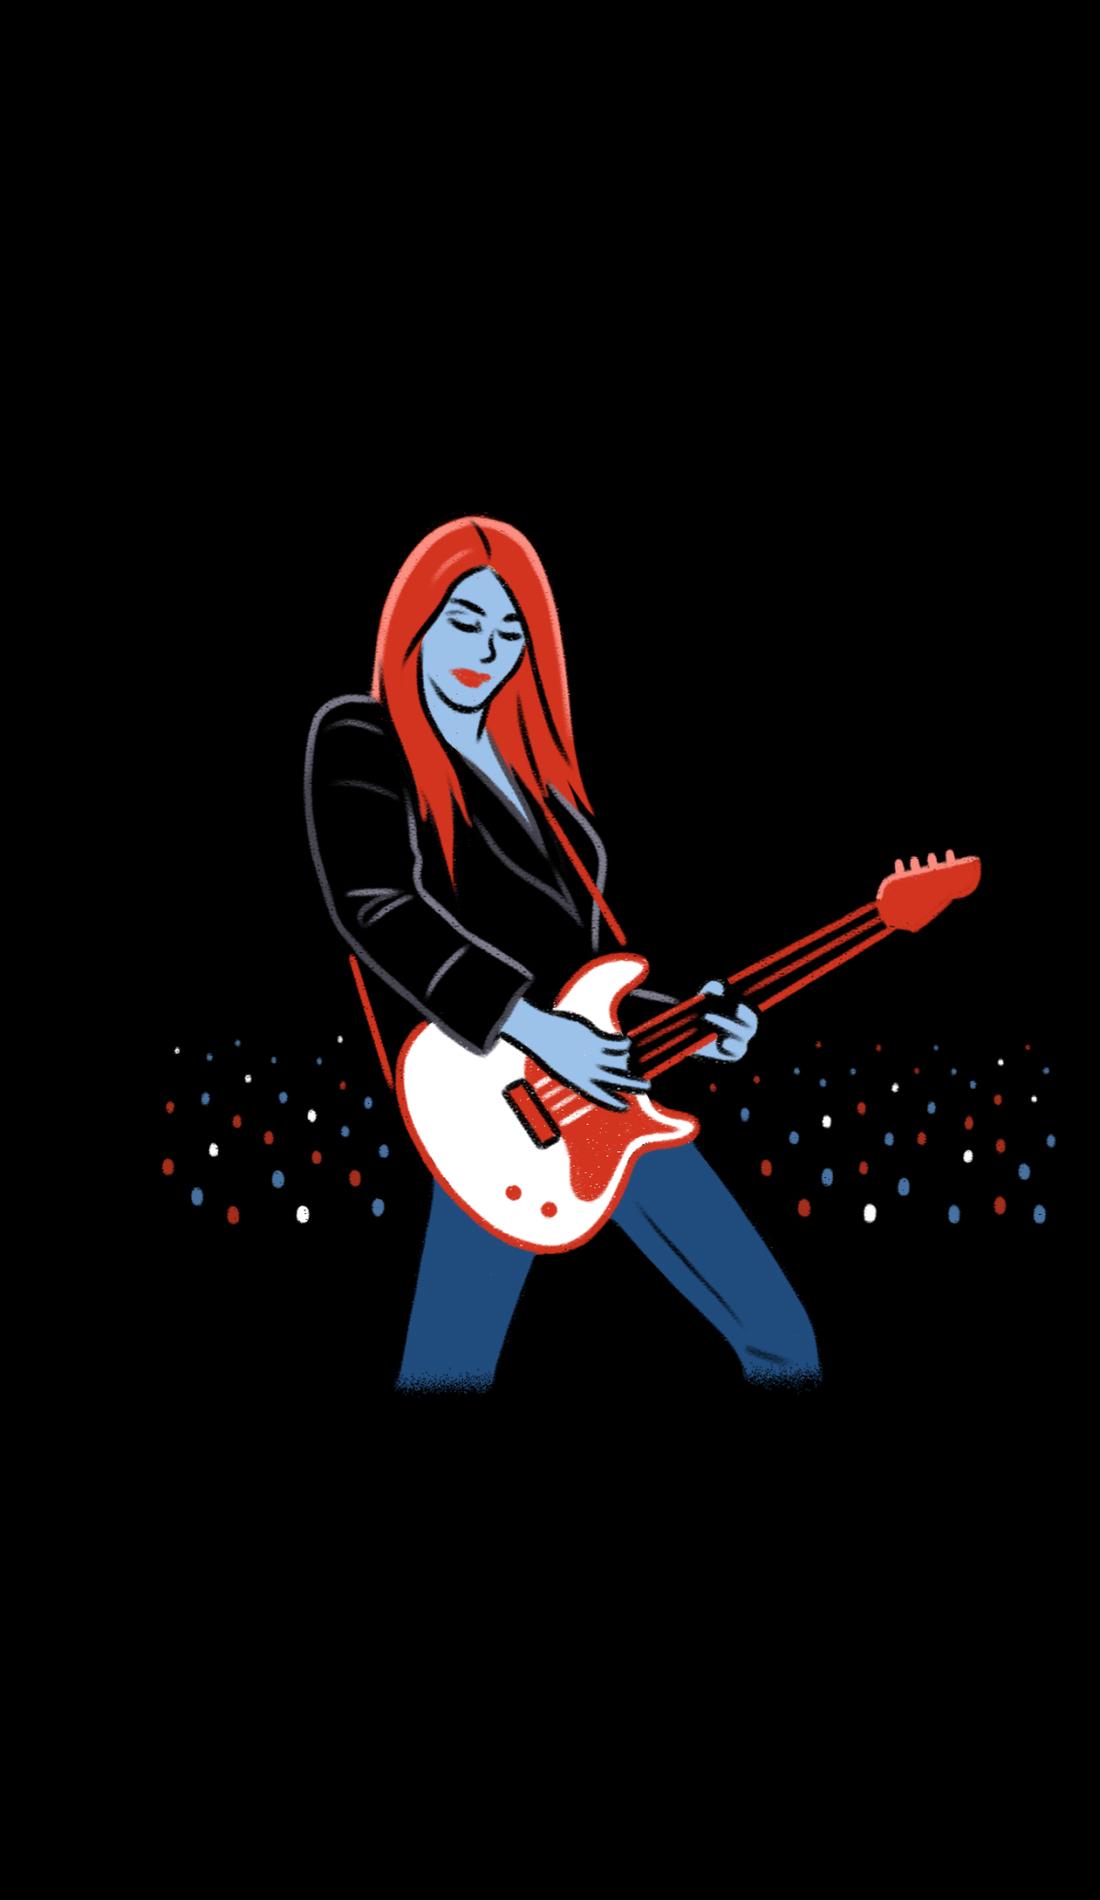 A Van Halen Nation live event